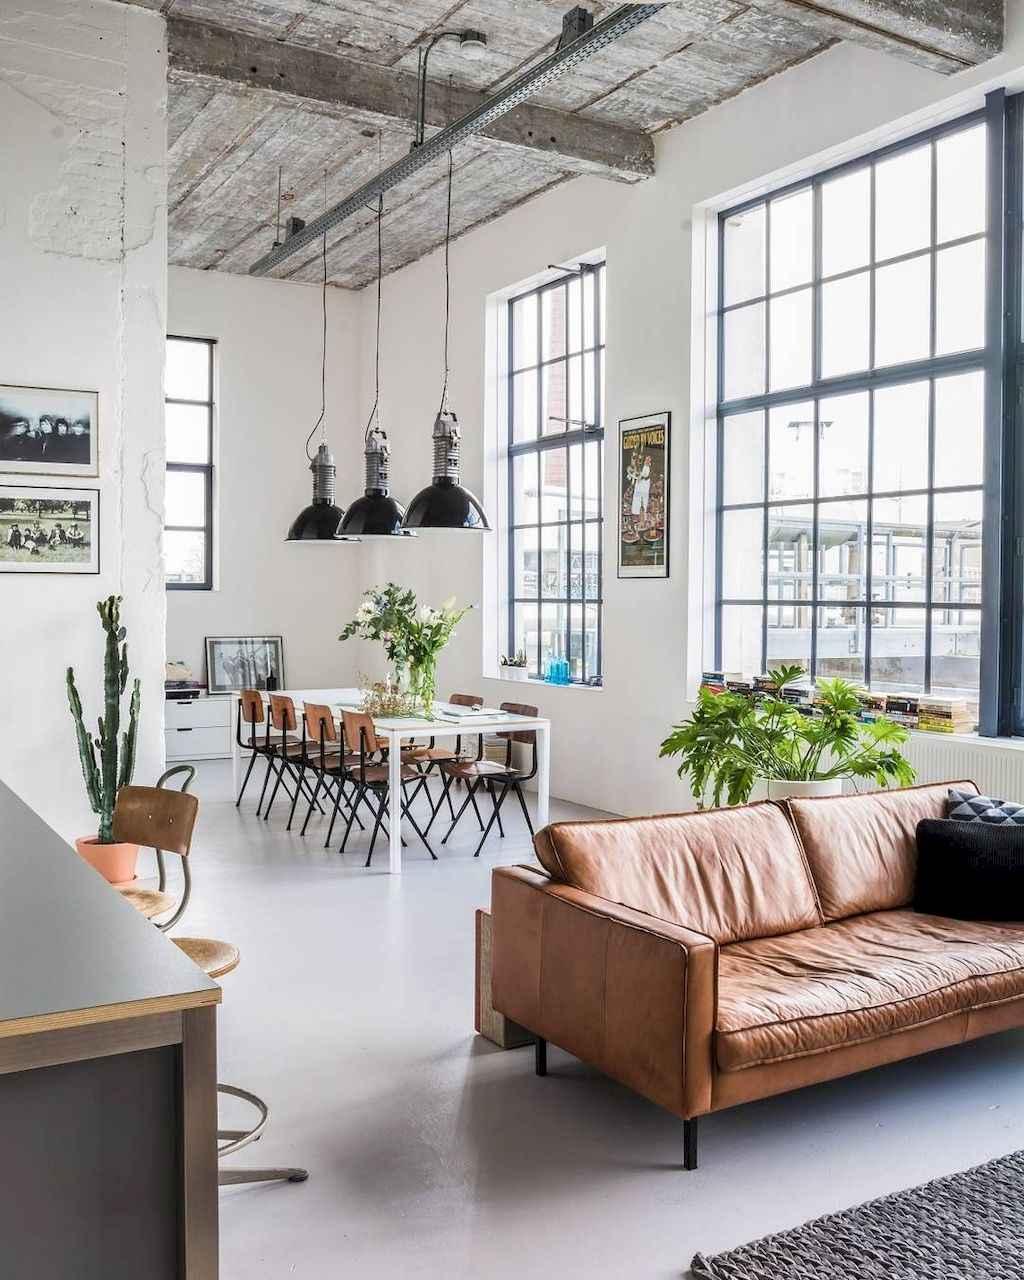 Cool creative loft apartment decorating ideas (31)